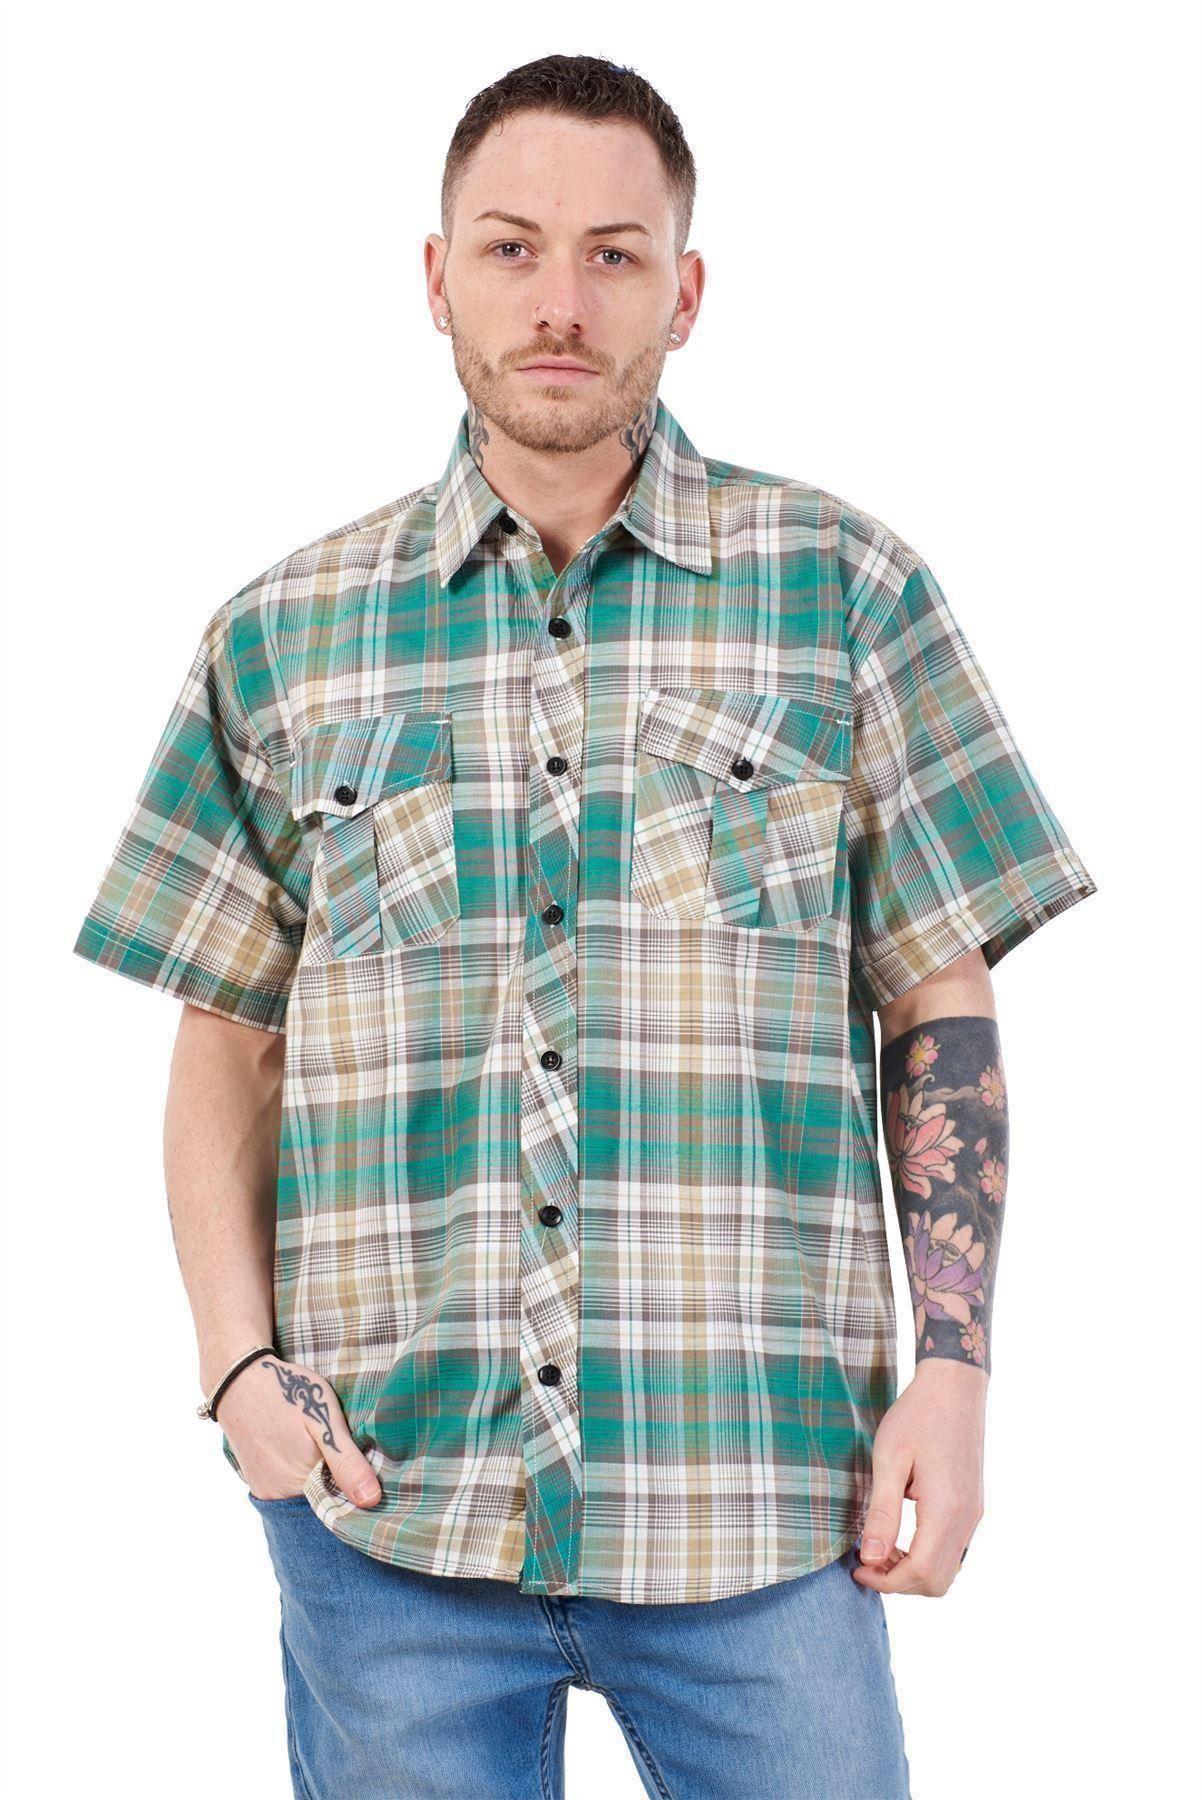 Mens-Regular-Big-Size-Shirts-Checked-Cotton-Blend-Casual-Short-Sleeve-Blue-M-5XL thumbnail 17